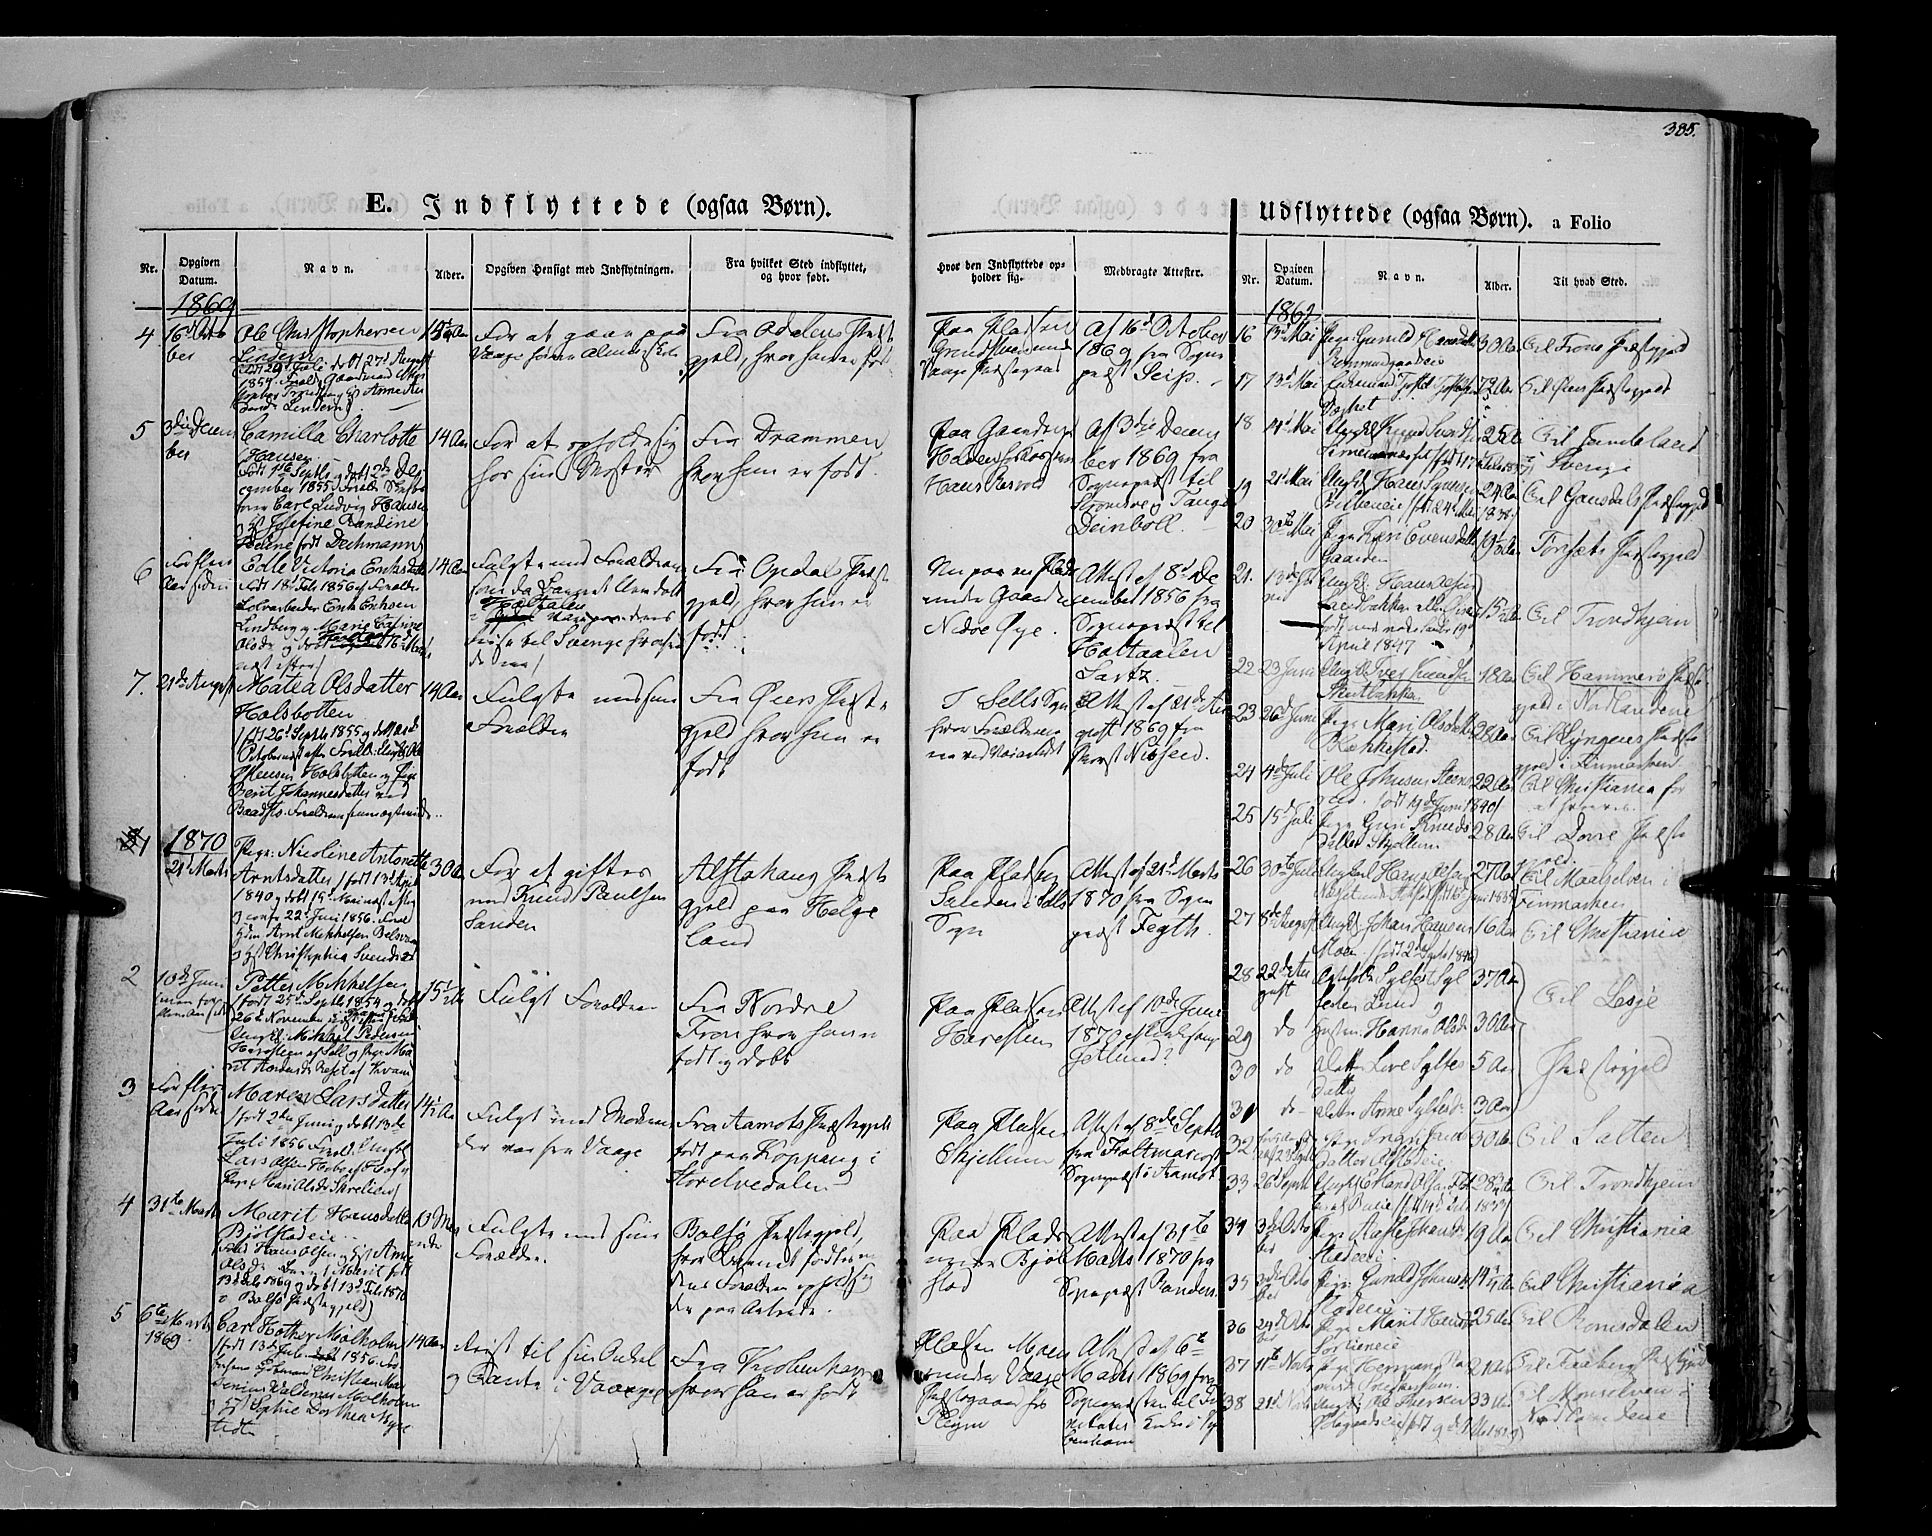 SAH, Vågå prestekontor, Ministerialbok nr. 6 /1, 1856-1872, s. 385